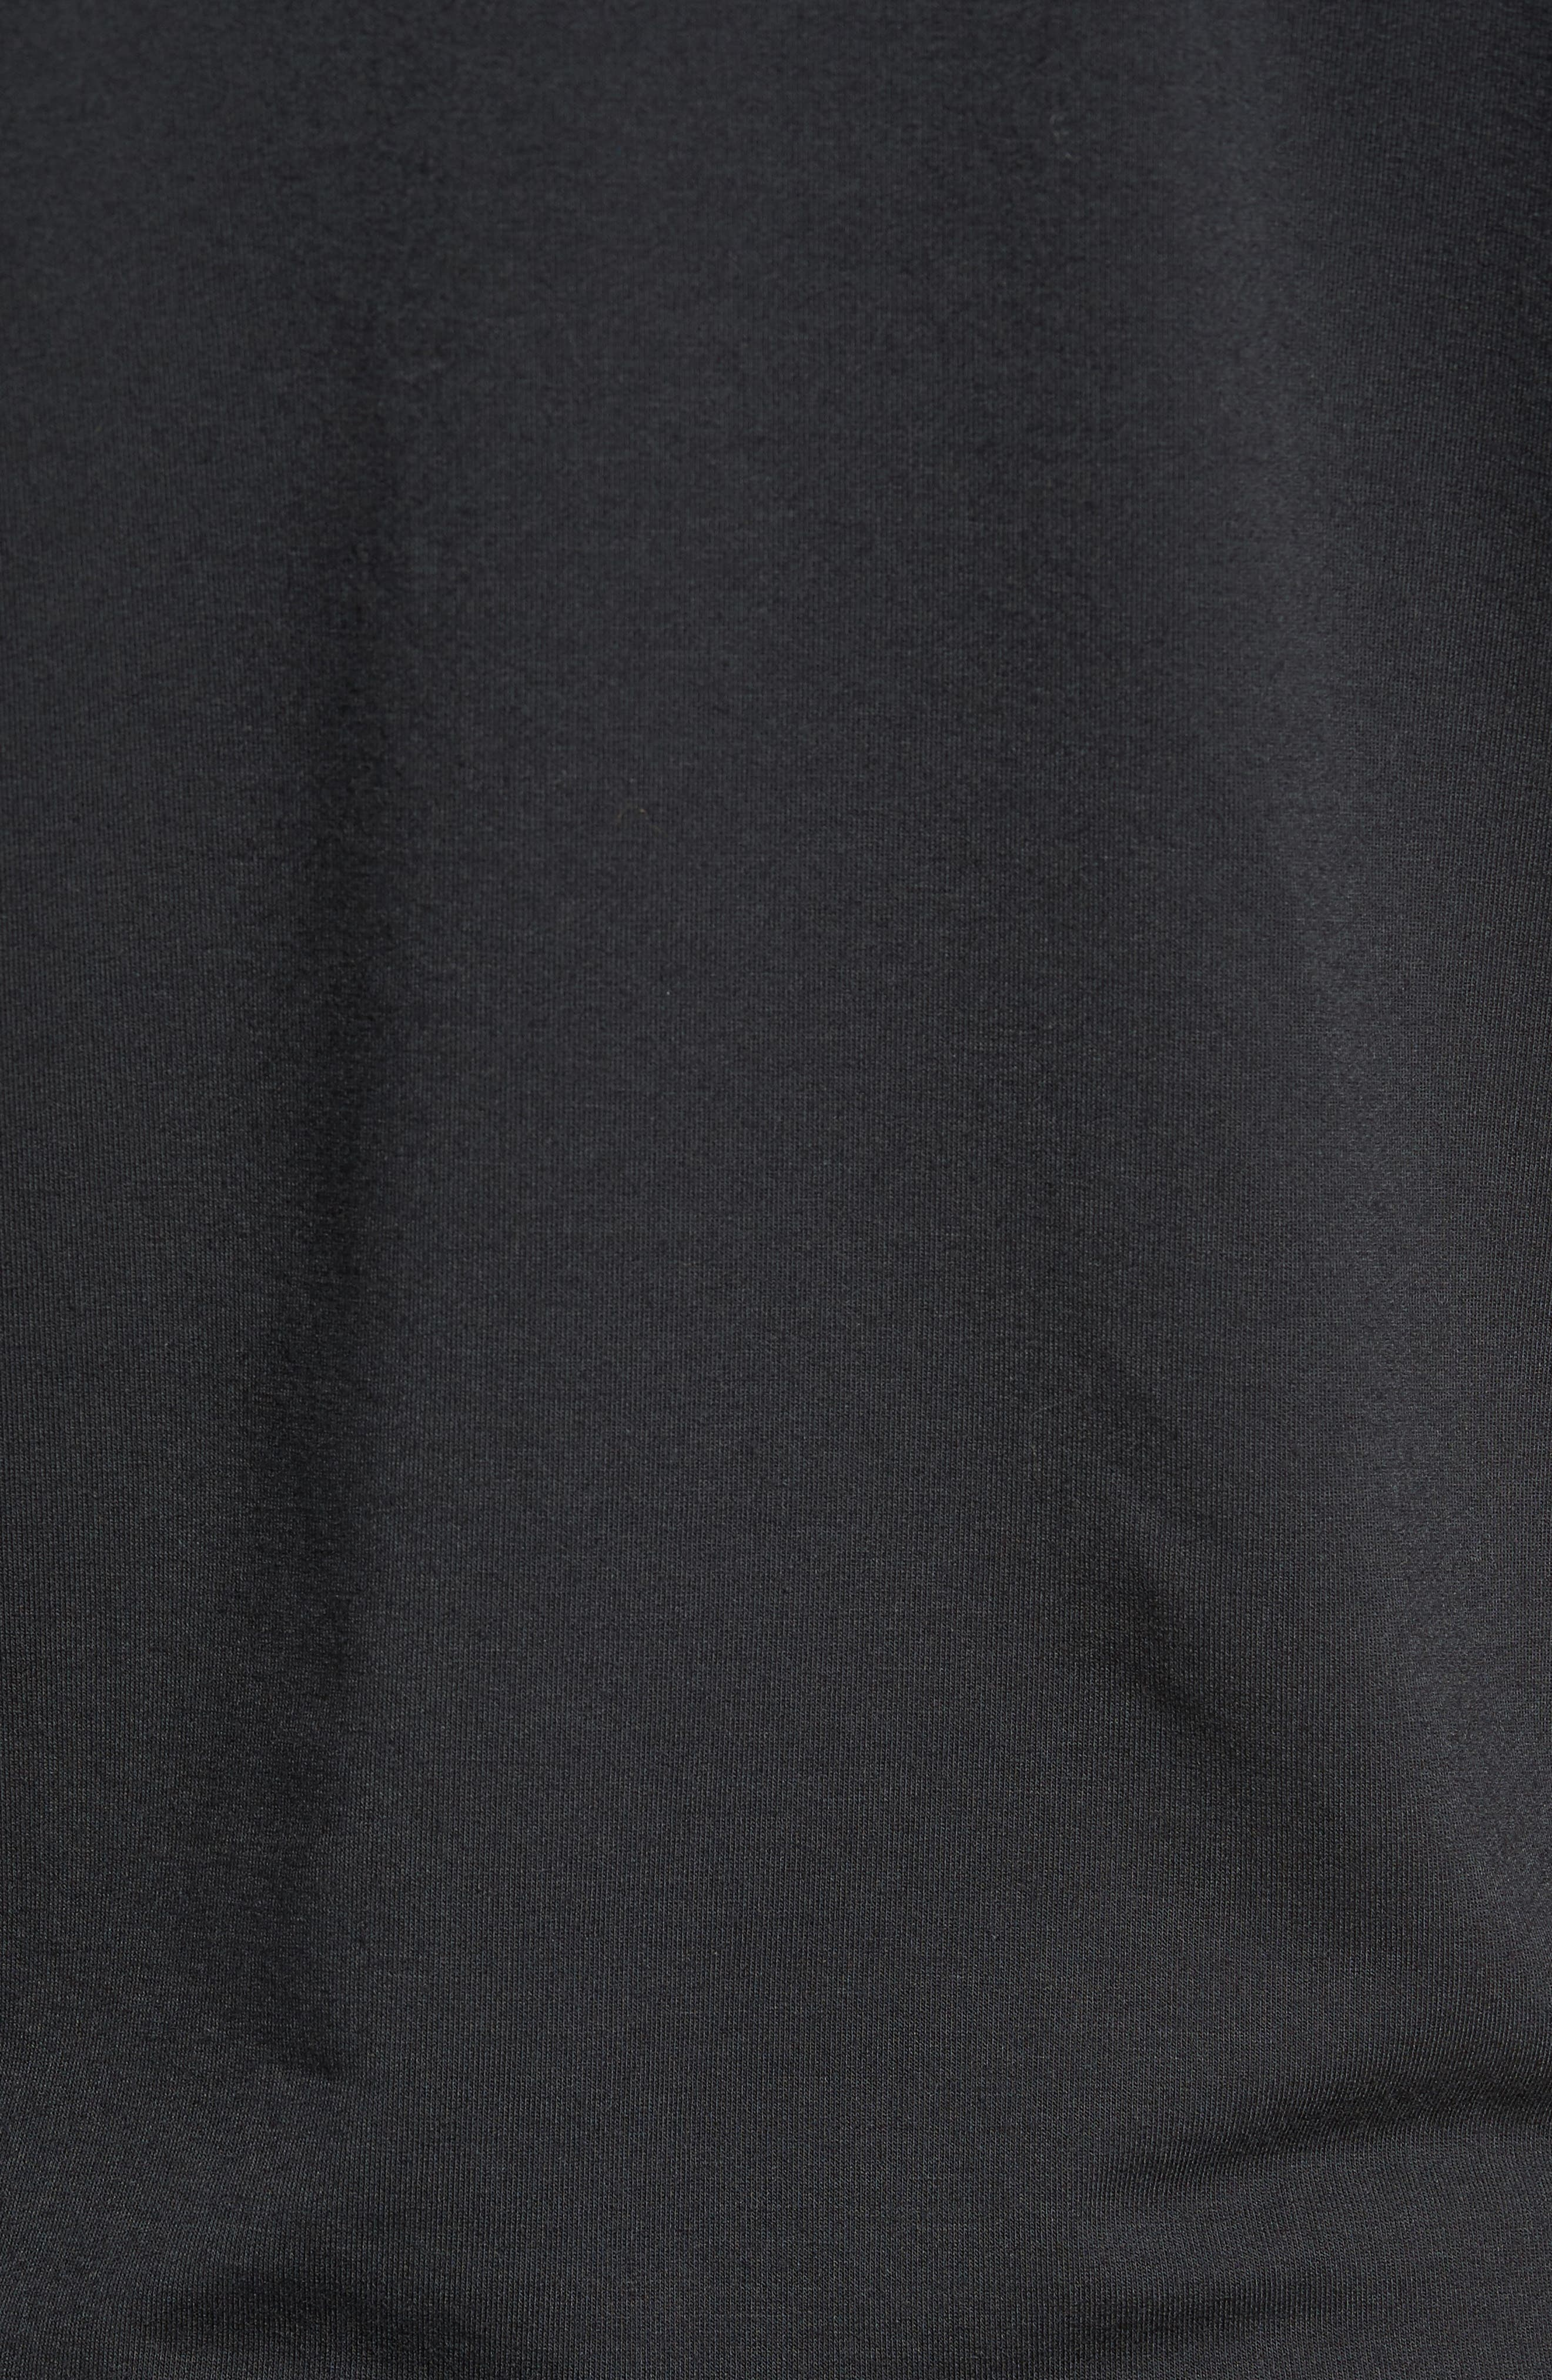 Distance Quarter Zip Pullover,                             Alternate thumbnail 5, color,                             Black